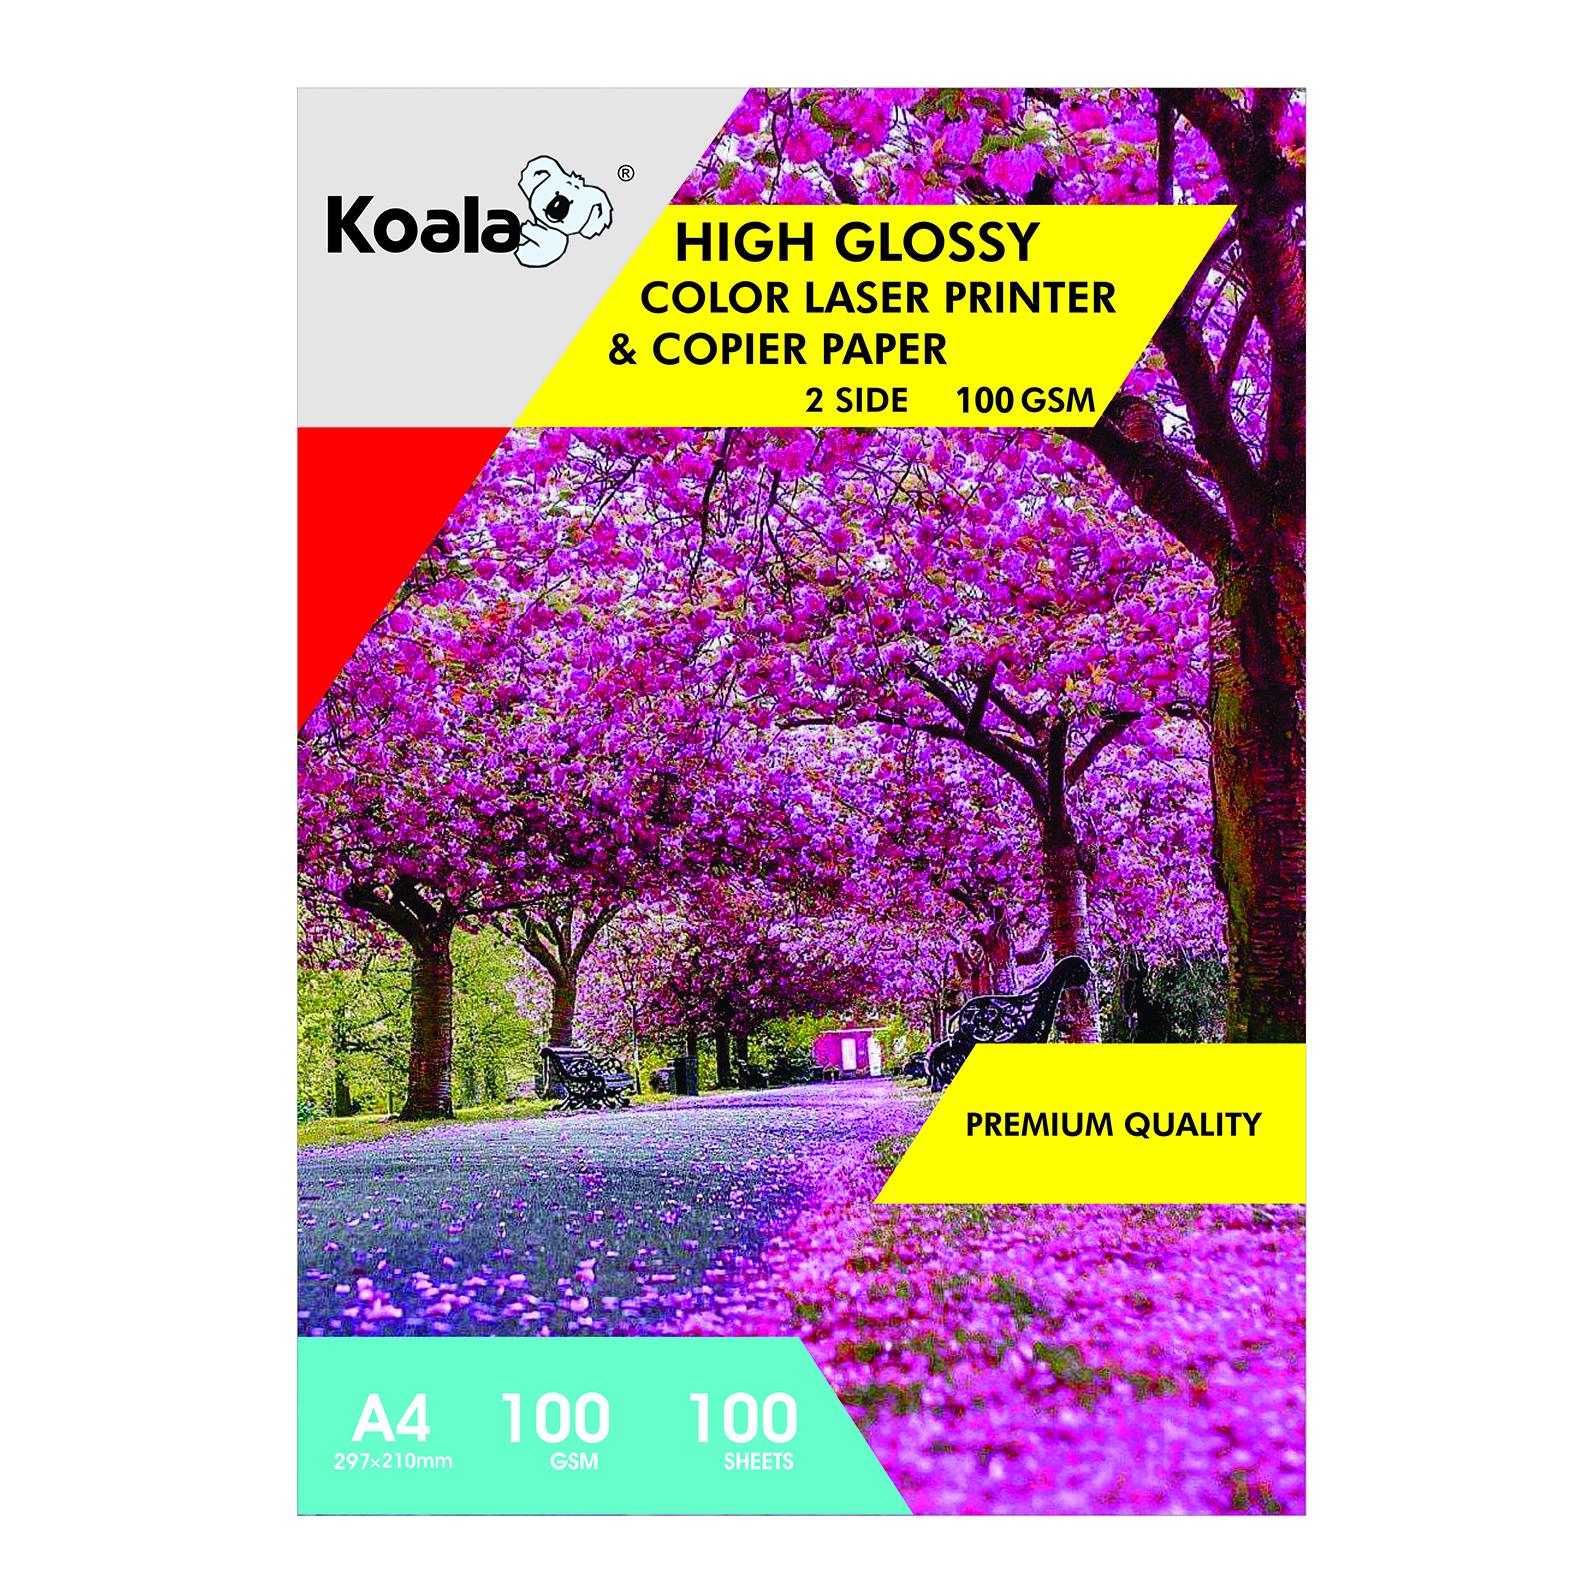 کاغذ چاپ گلاسه کوالا مدل K100 سایز A4 بسته 100 عددی